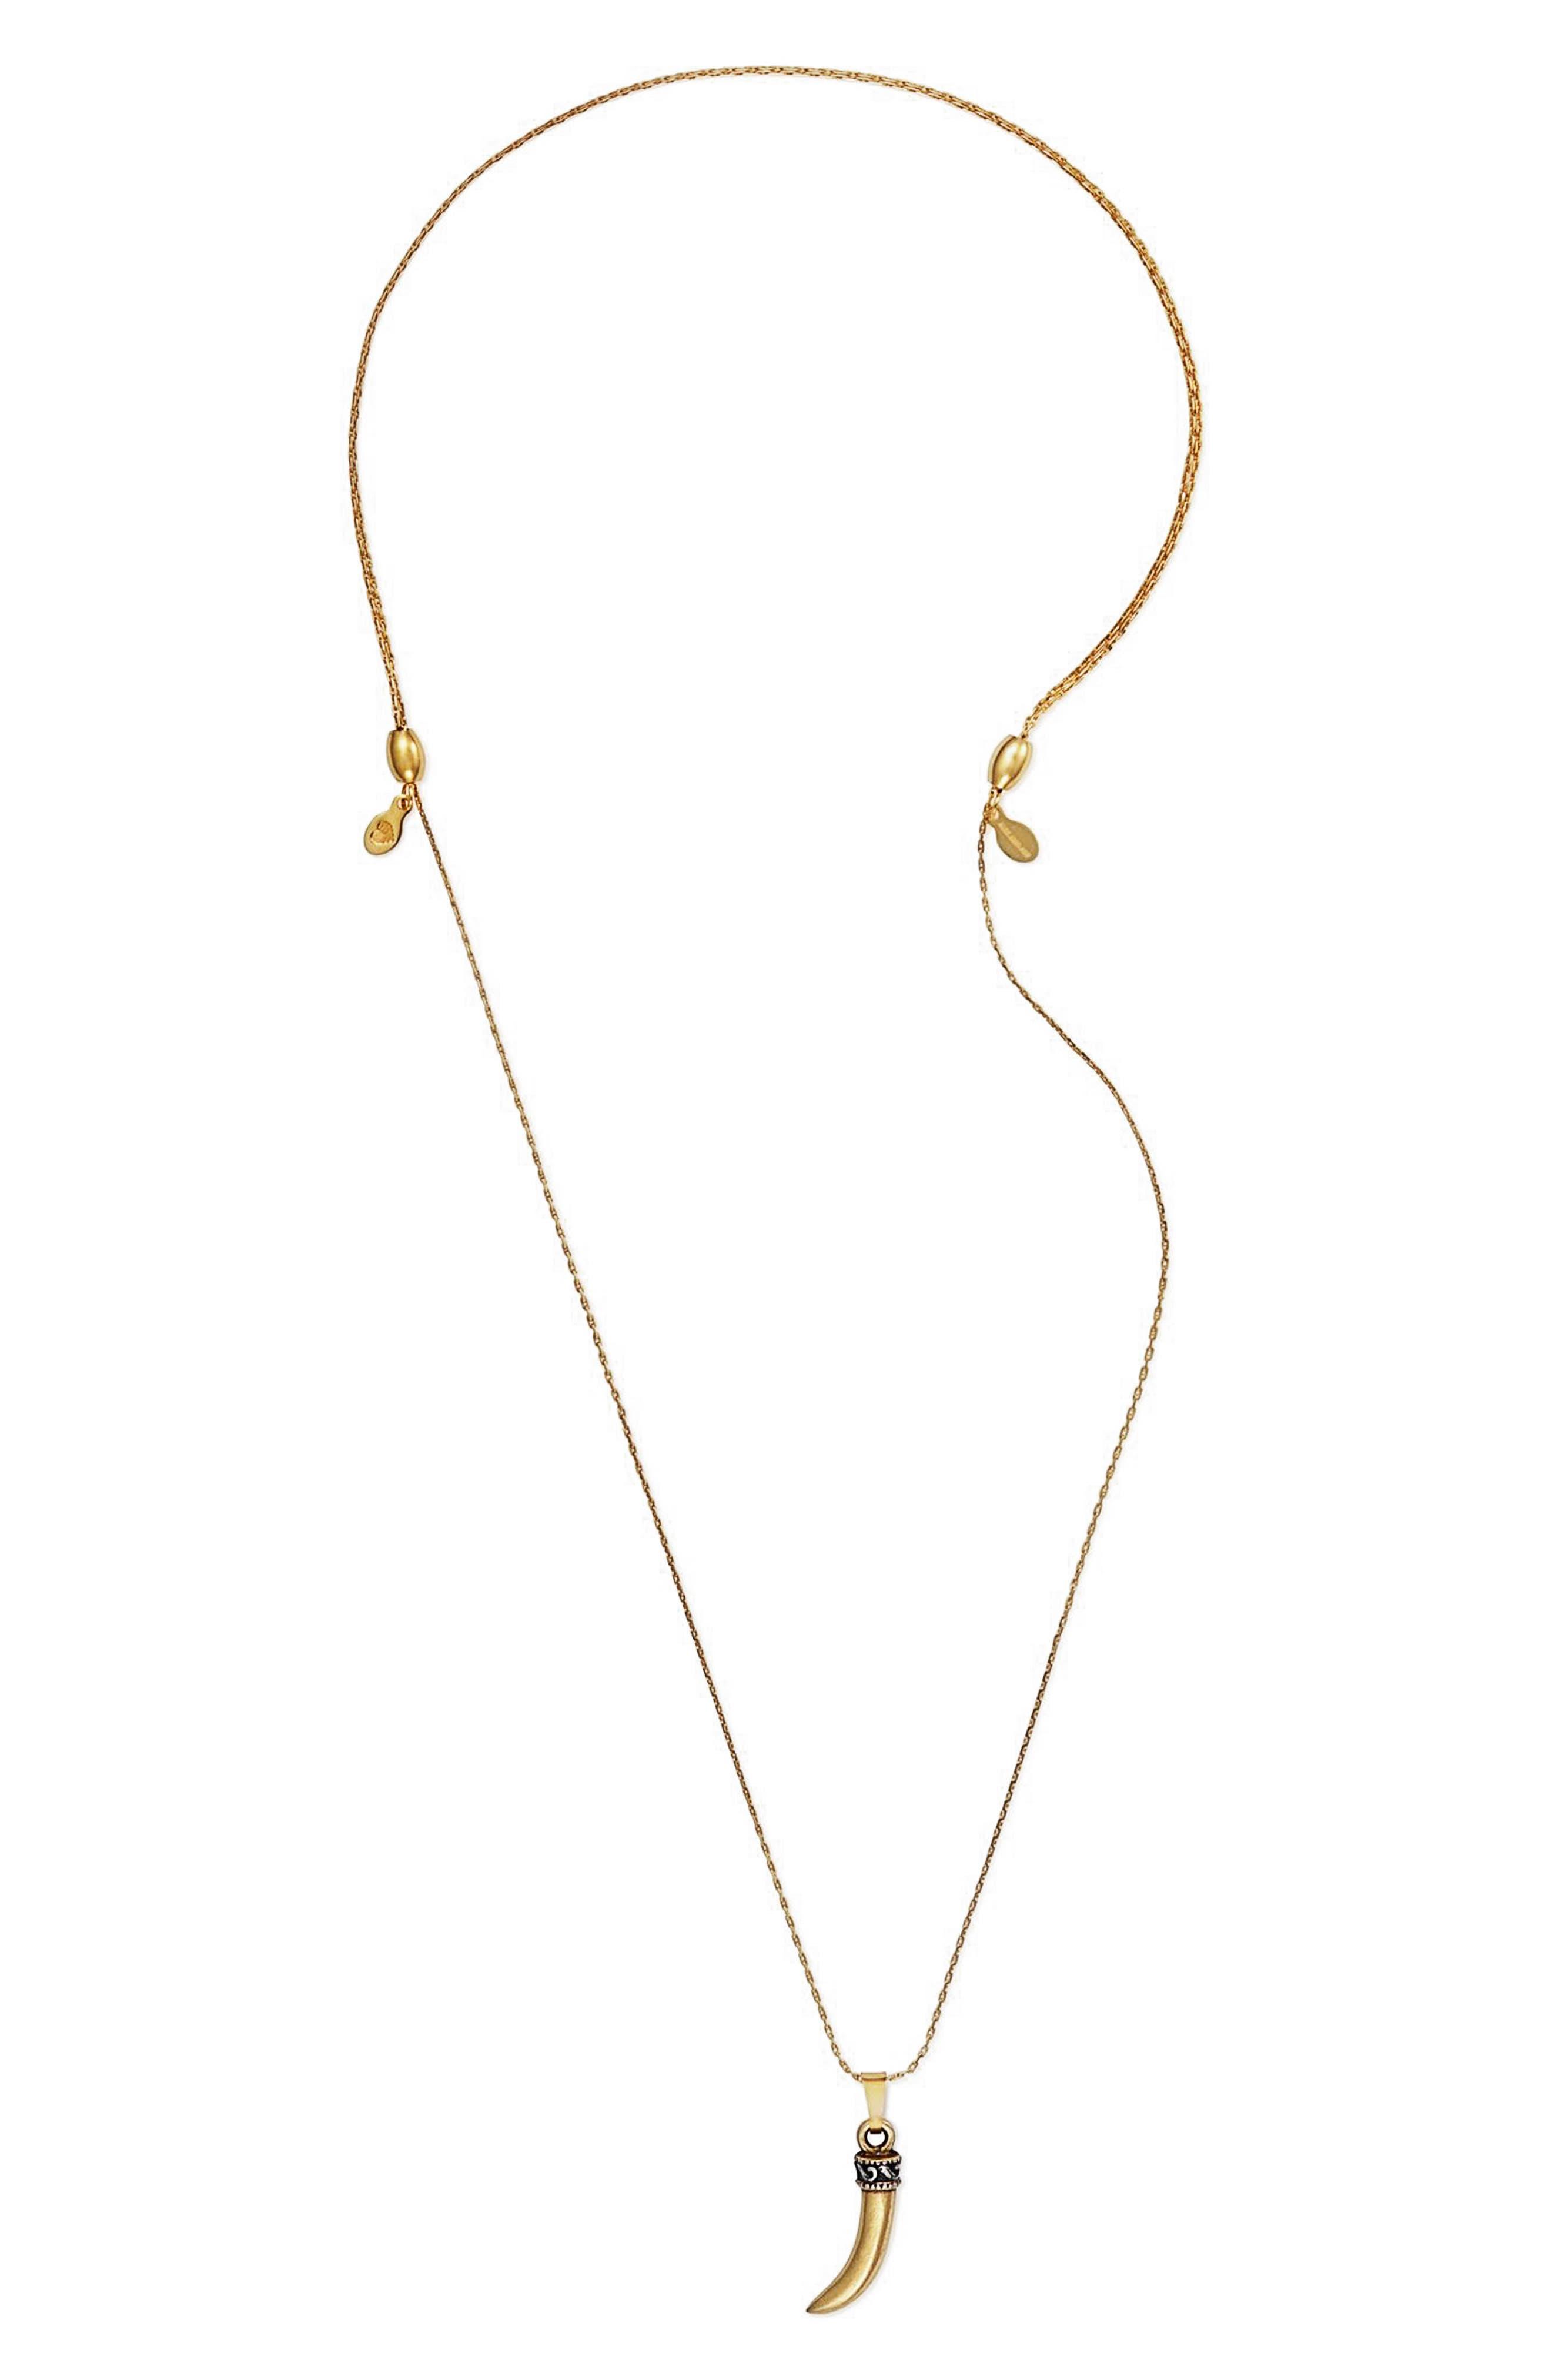 Main Image - Alex and Ani Horn Expandable Pendant Necklace